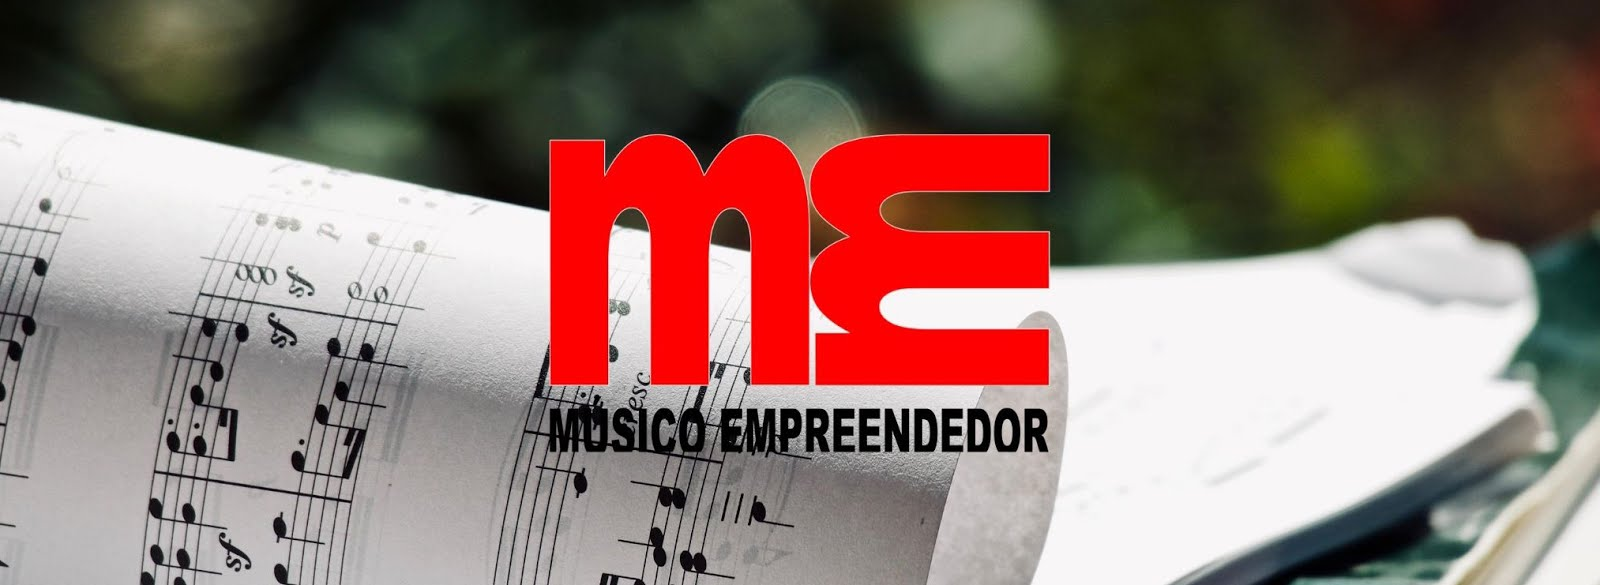 Músico Empreendedor